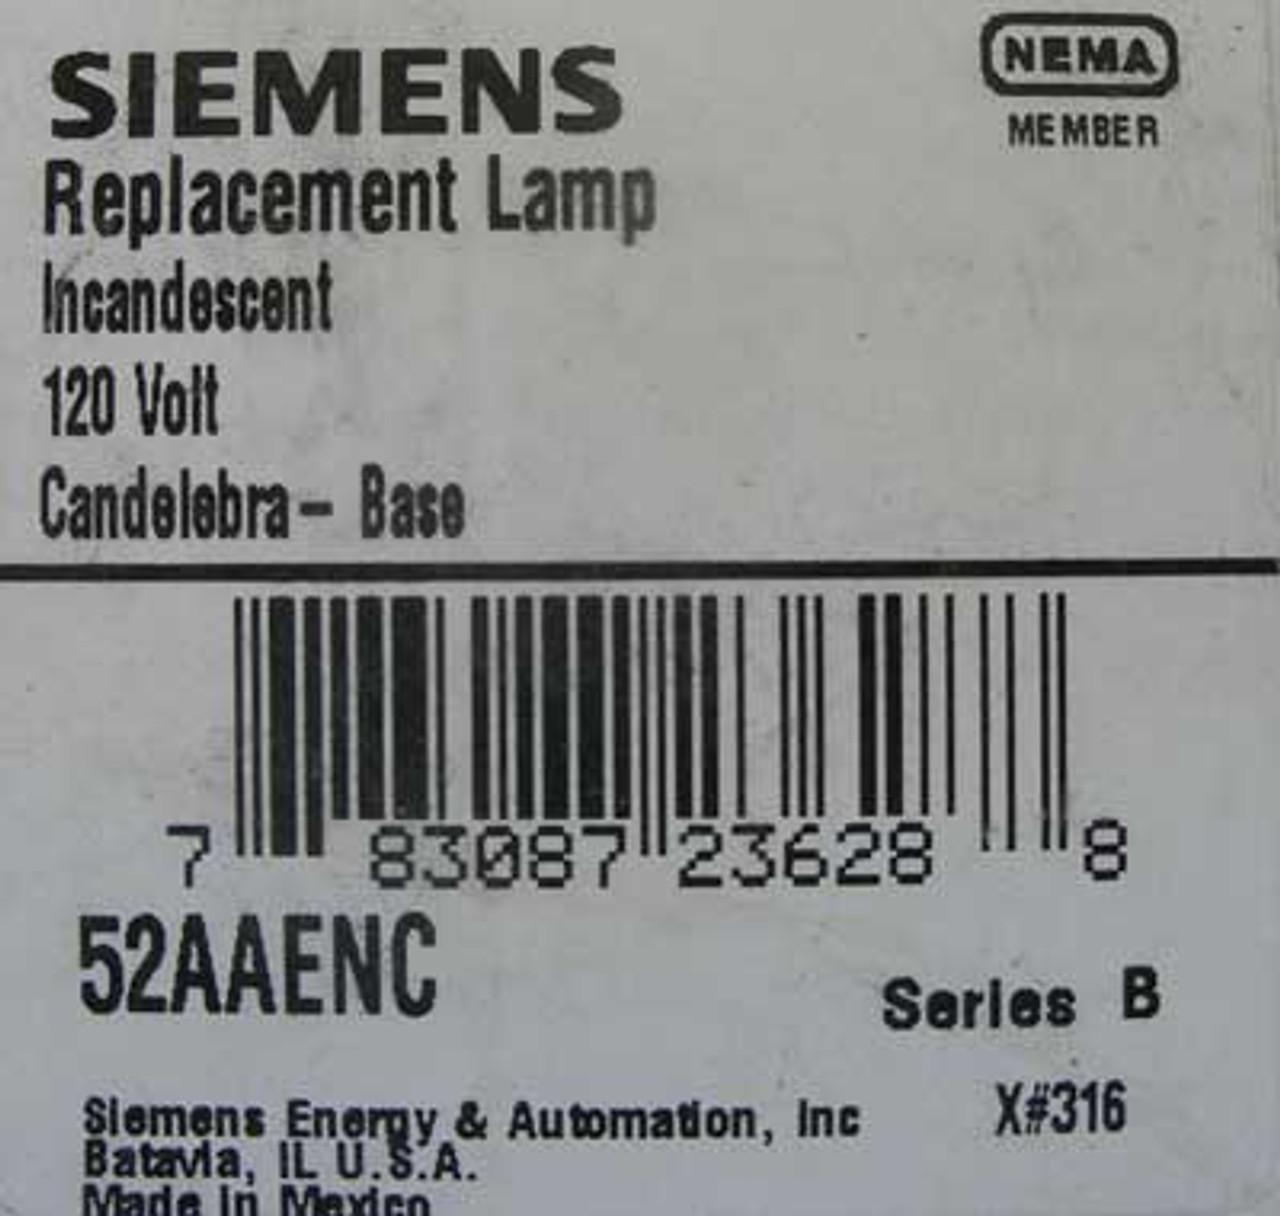 Siemens 52AAENC 120V Incandescent Replacement Lamp